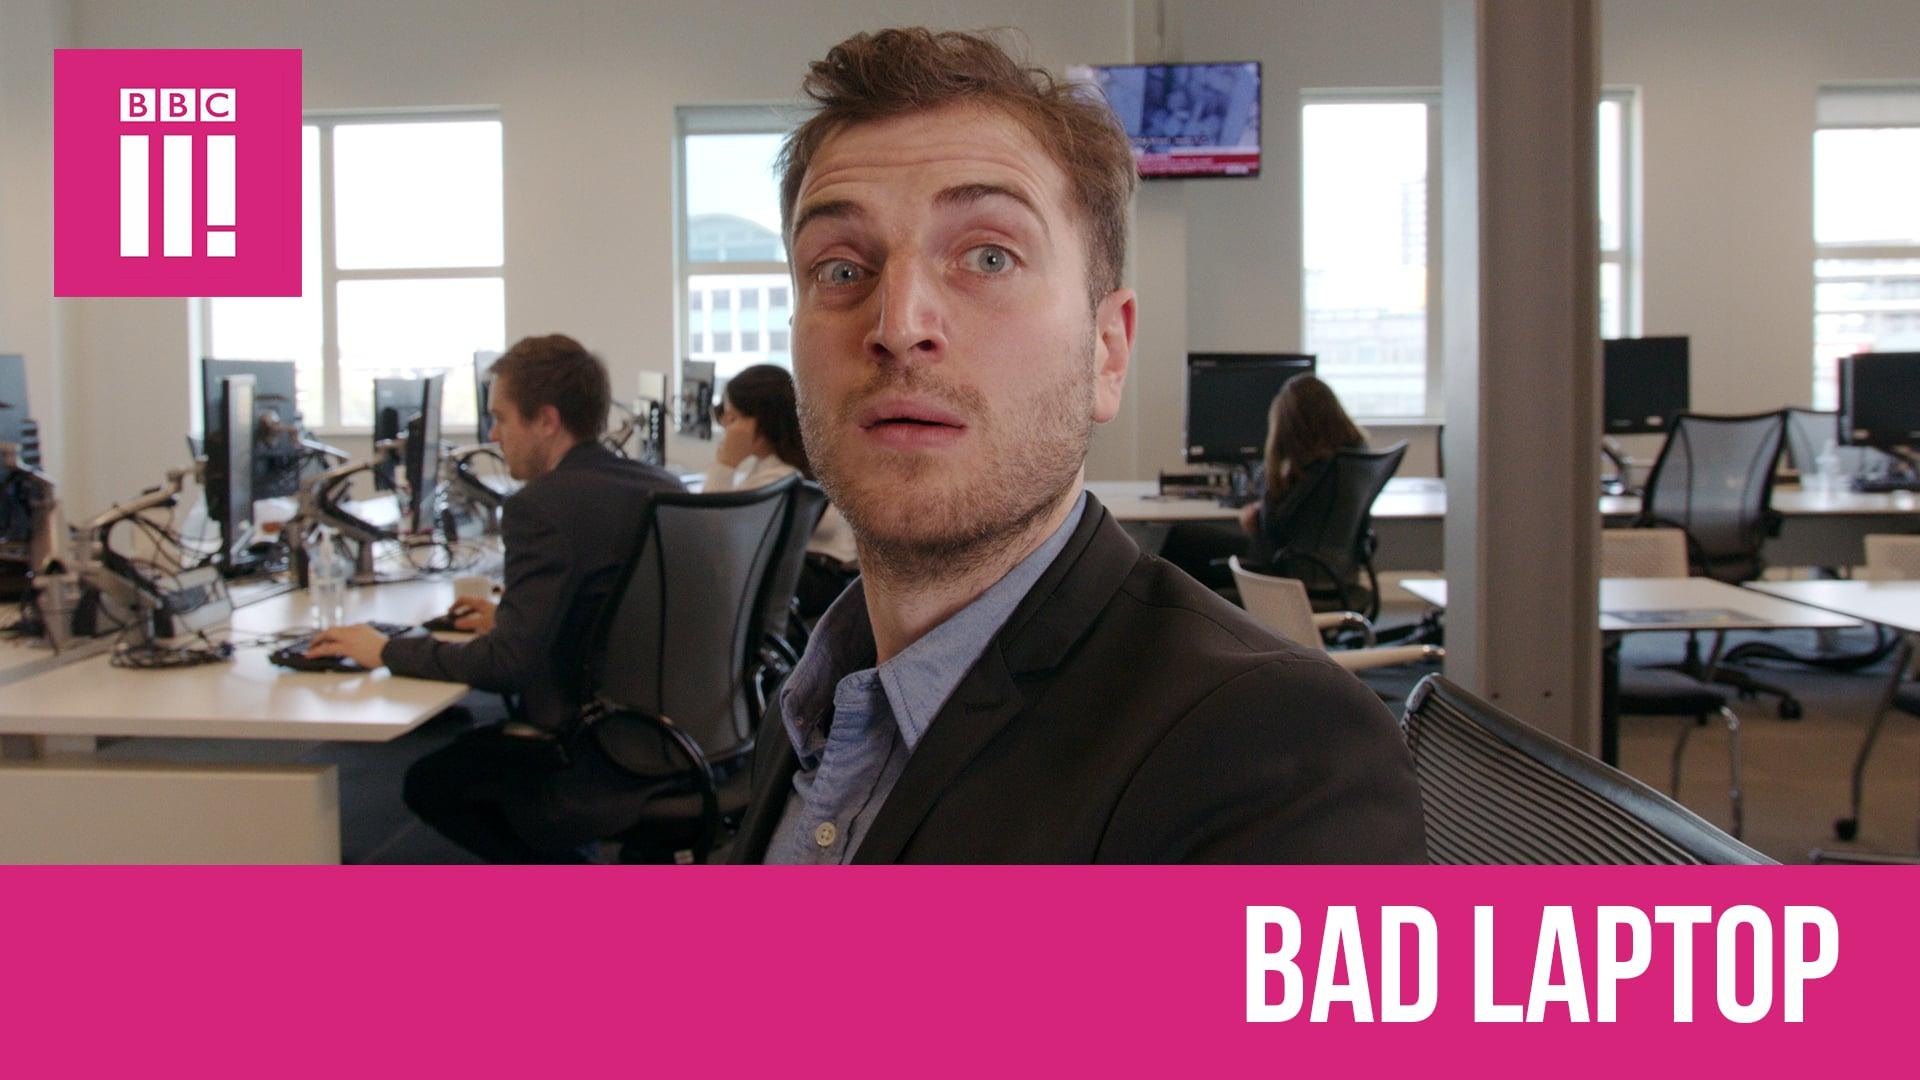 Bad Laptop - BBC Three